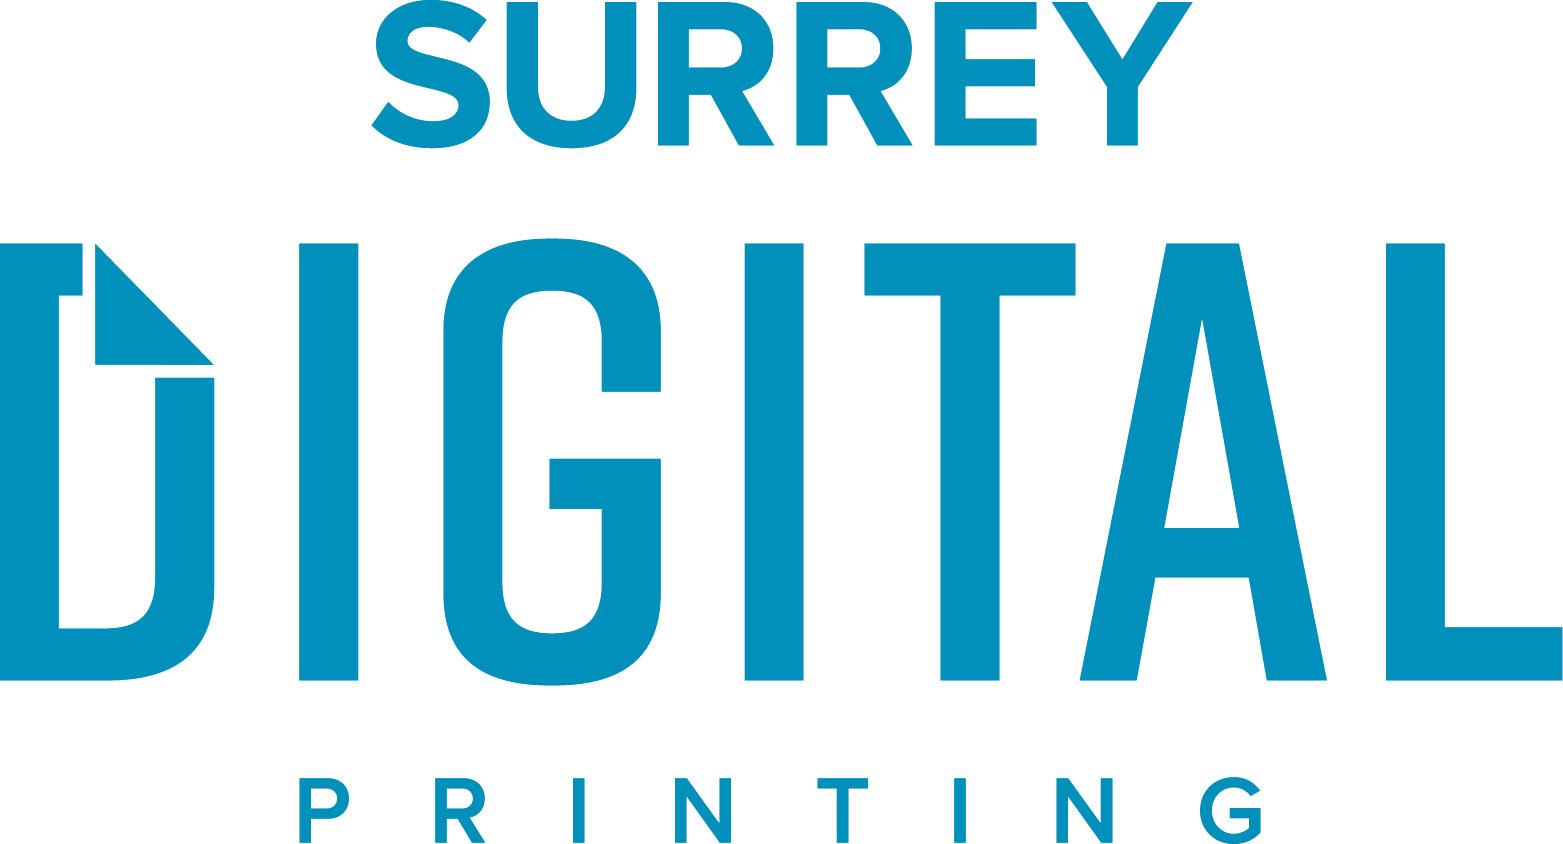 Surrey Digital Logo